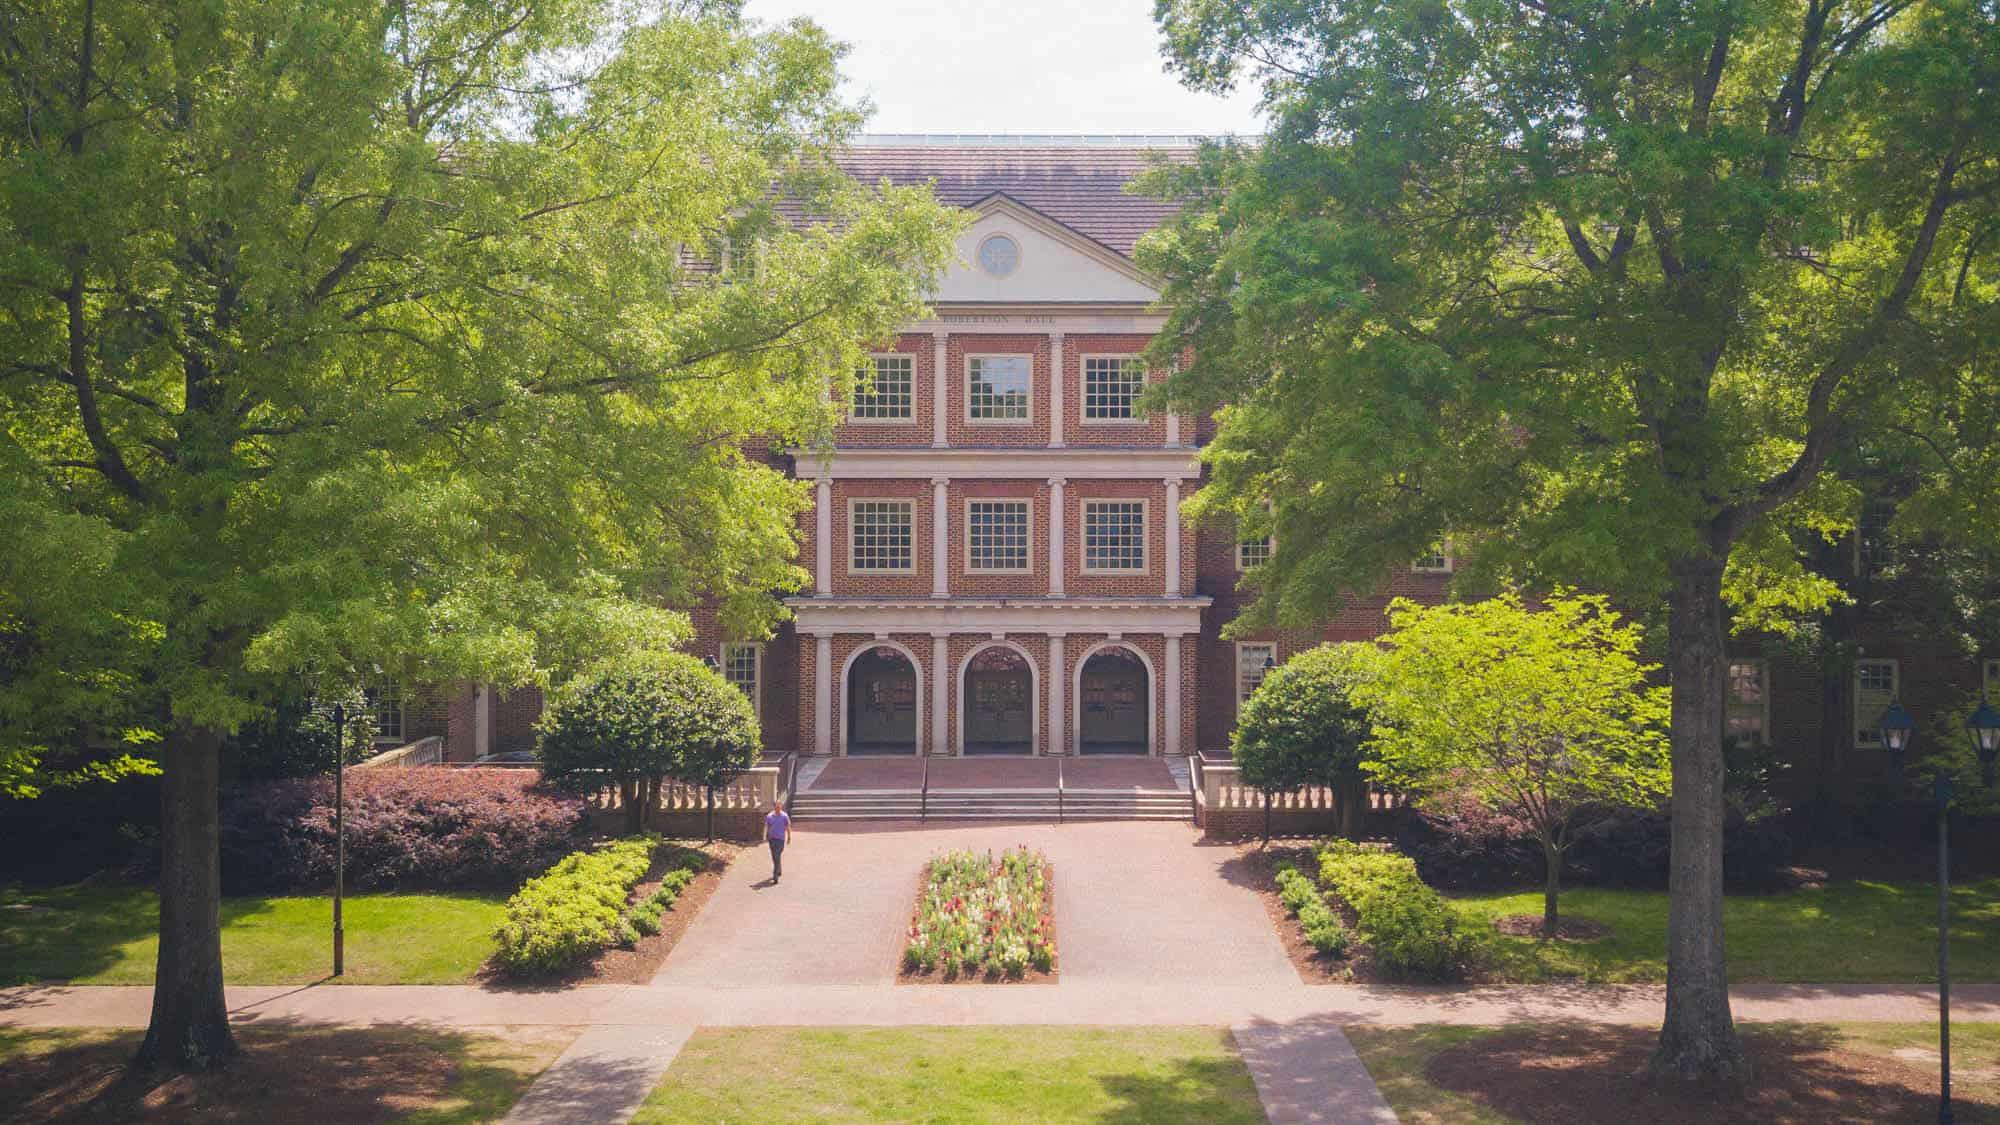 Robertson Hall, which houses Regent University's law school in Virginia Beach.